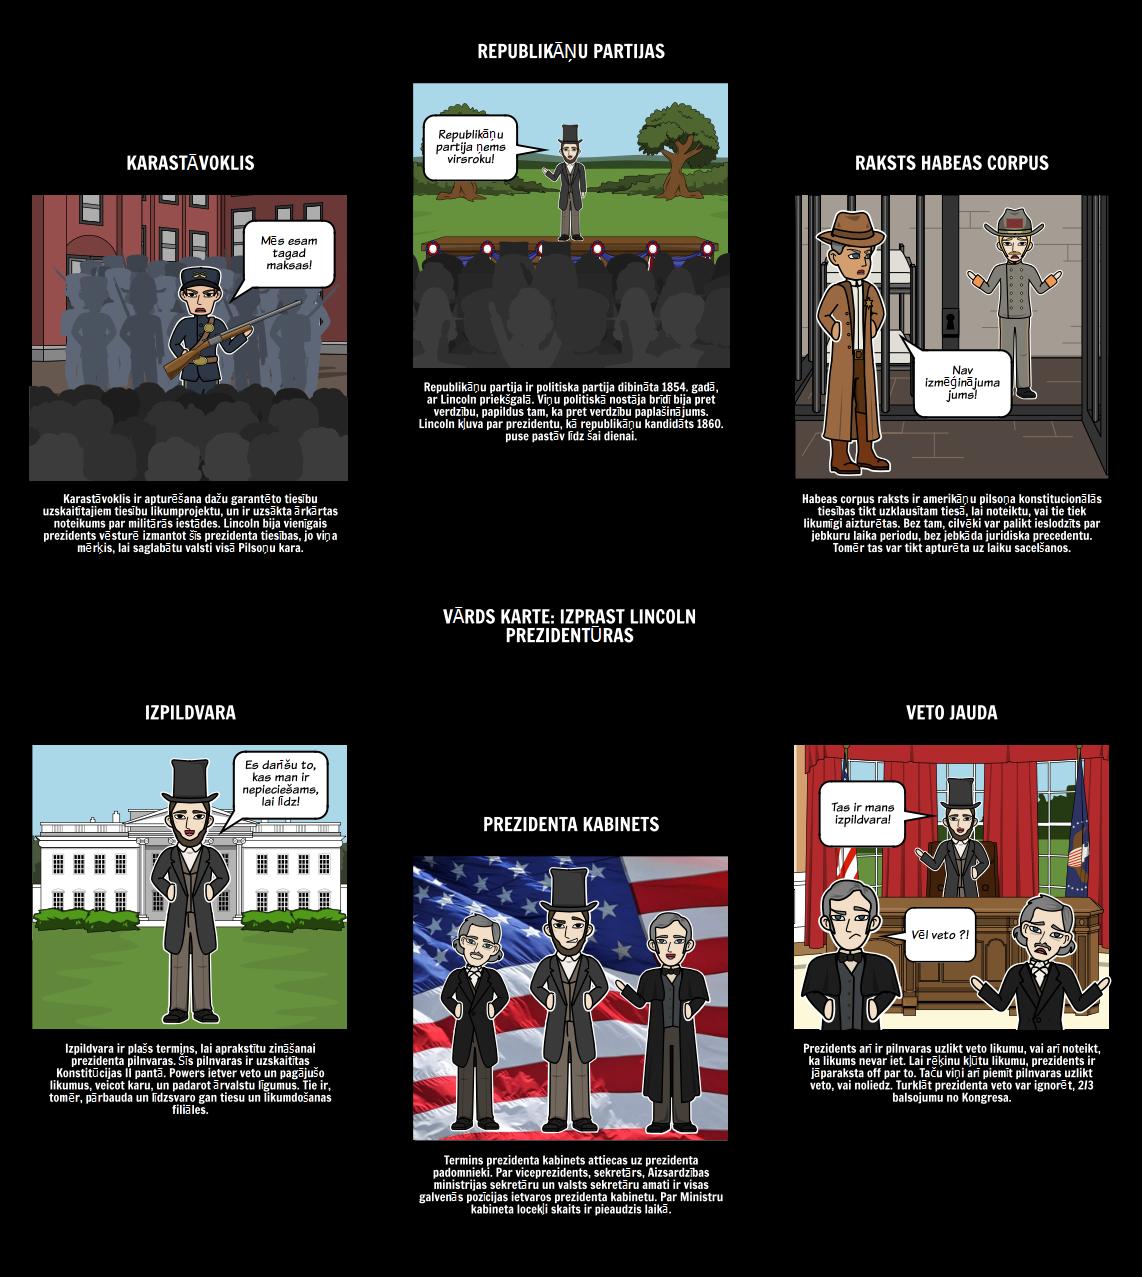 Abraham Lincoln Prezidentūras Word Karte